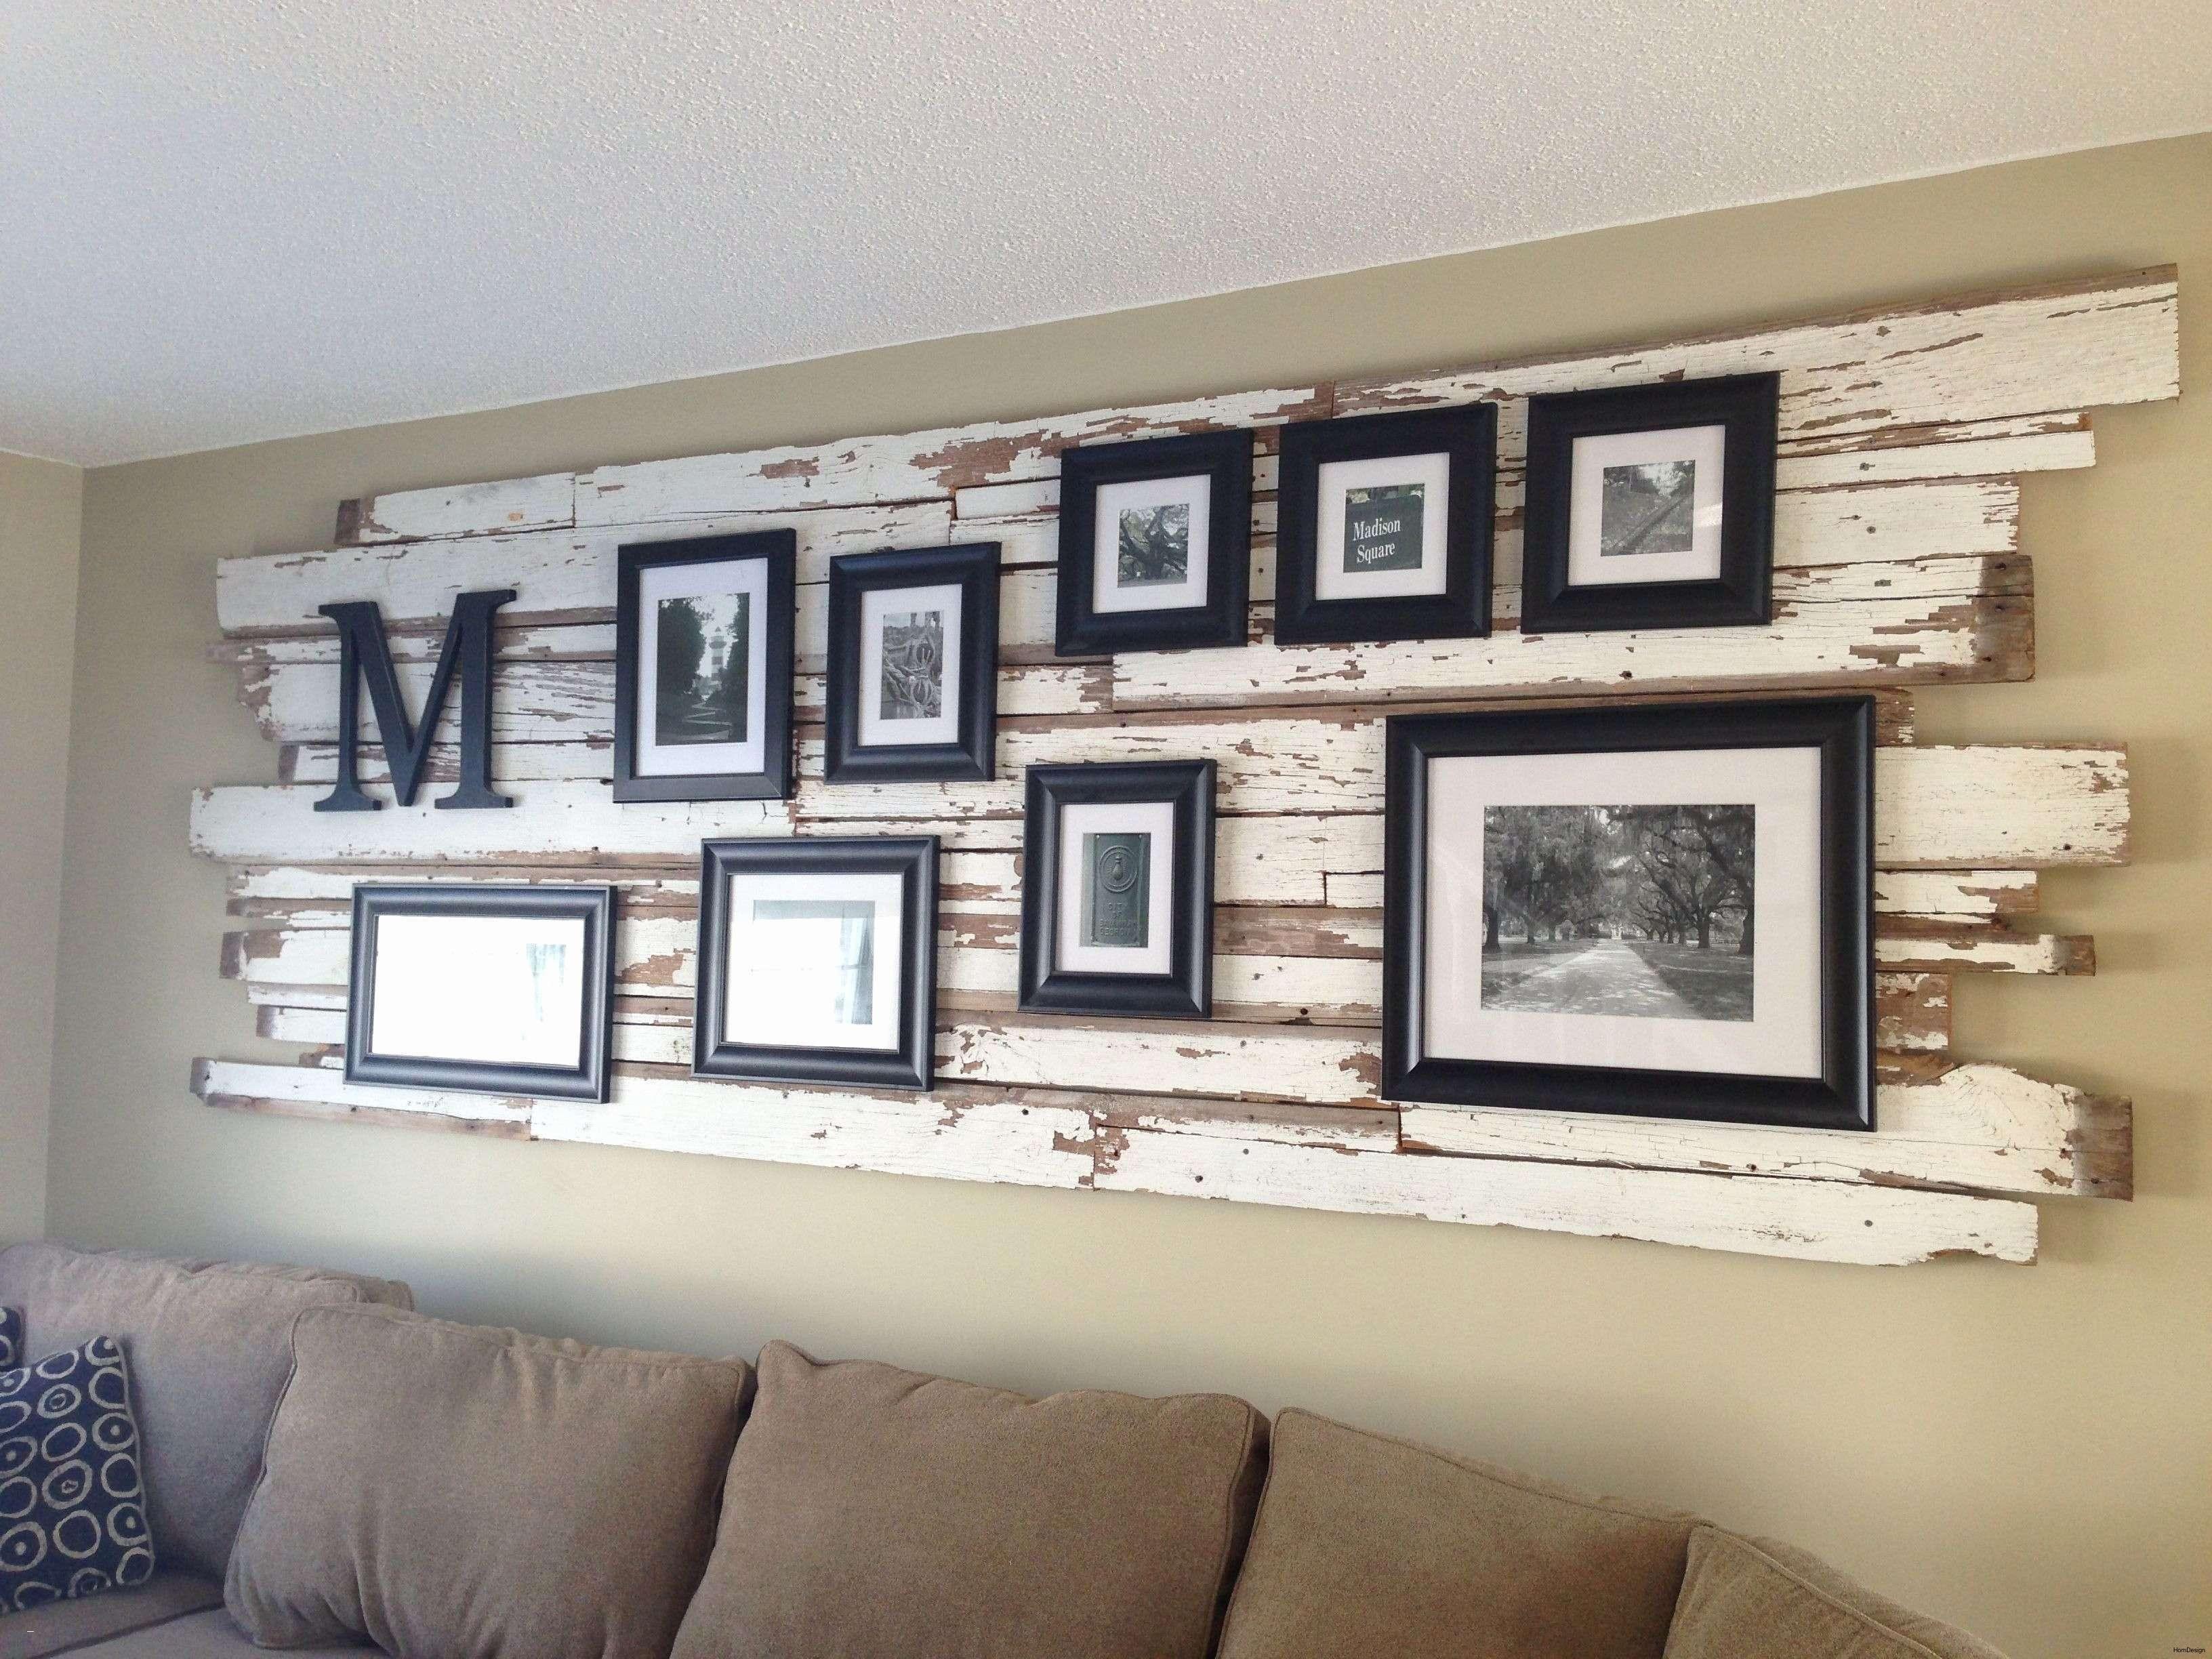 DIY Pallet Wall Art Decor Ideas  Room wall decor, Decor, Wall